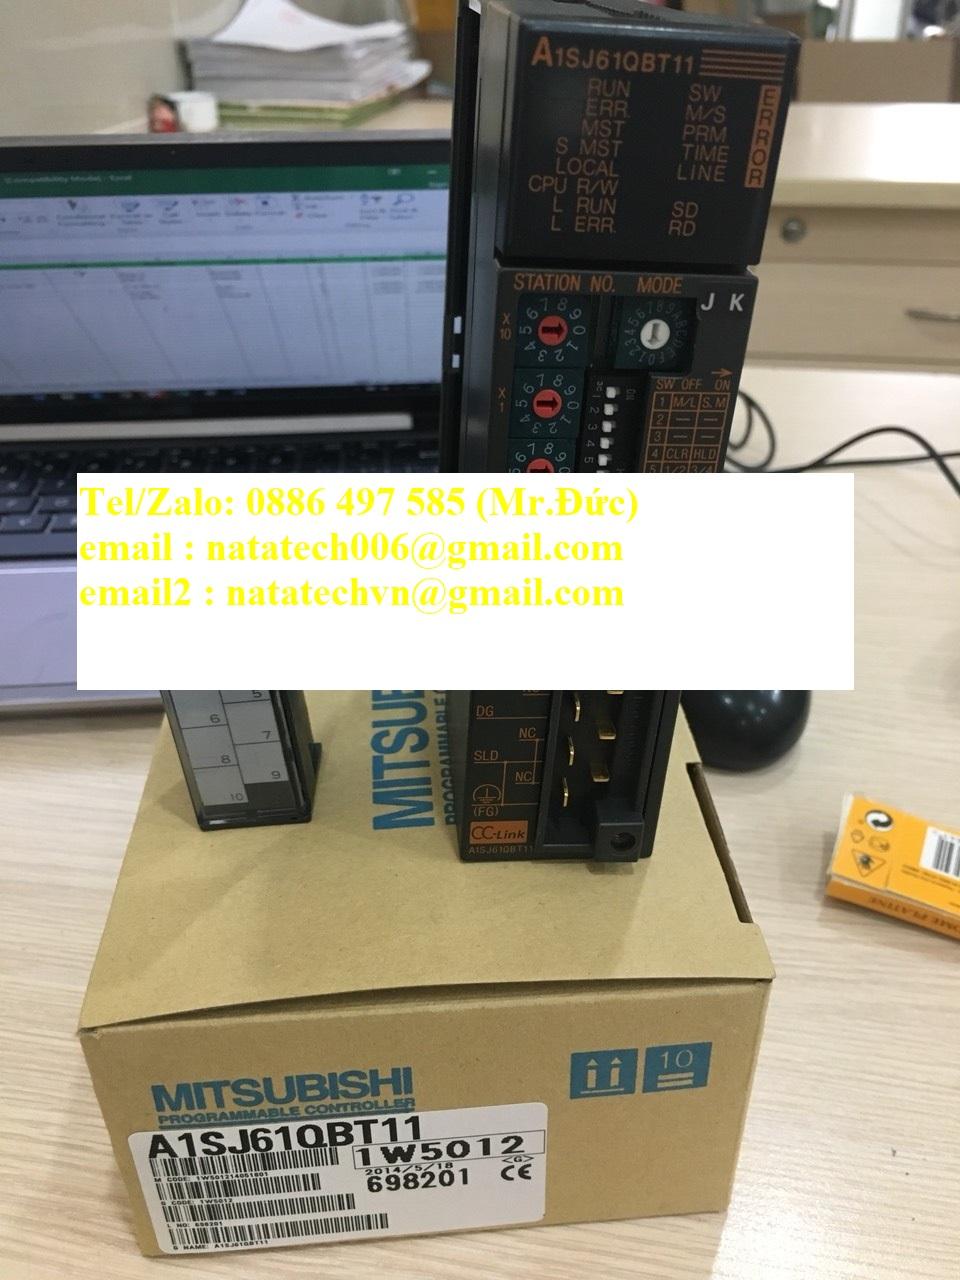 CC-LINK MODULE A1SJ61QBT11 - Cty TNHH Natatech